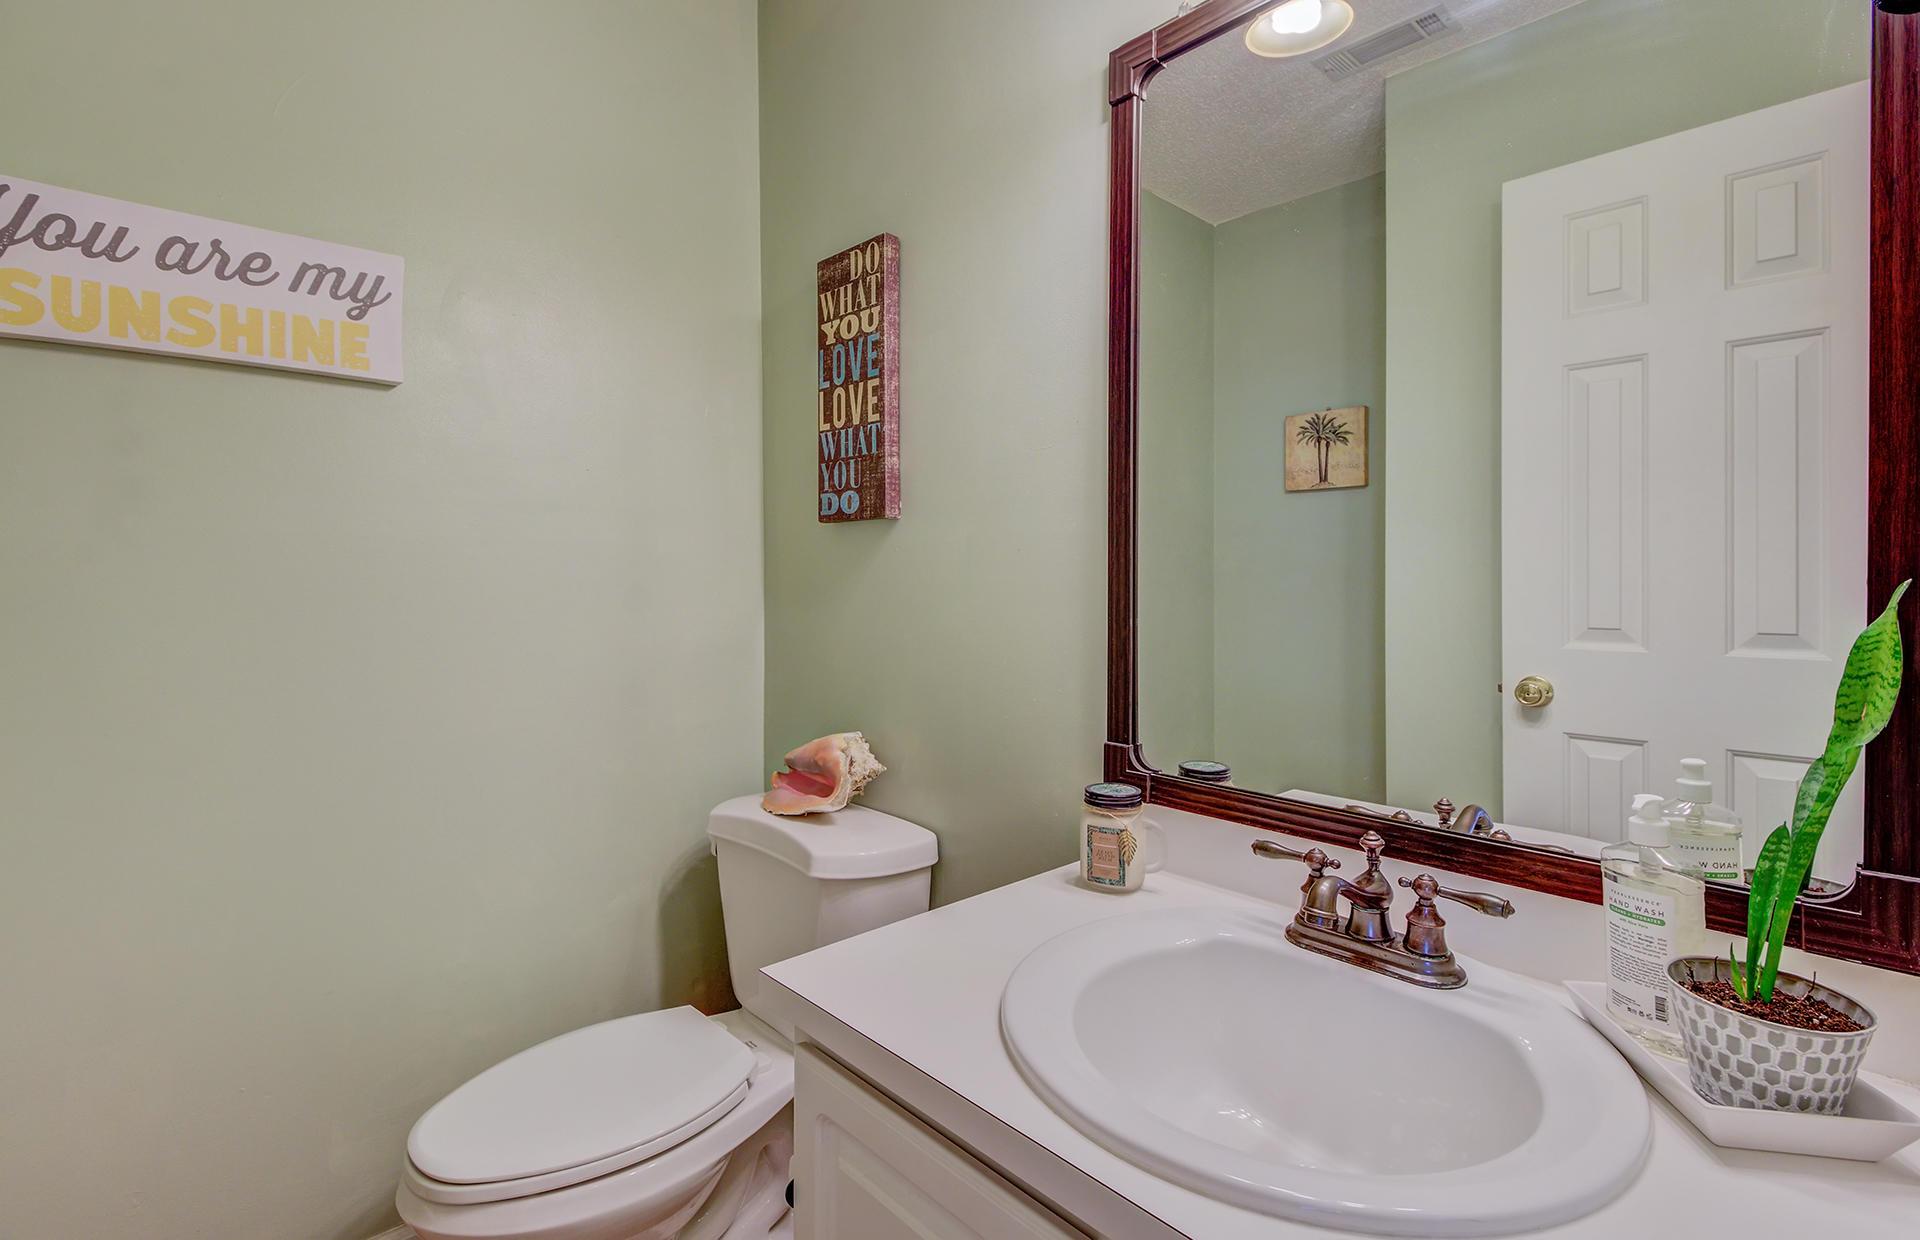 Wando East Homes For Sale - 1664 Hunters Run, Mount Pleasant, SC - 21